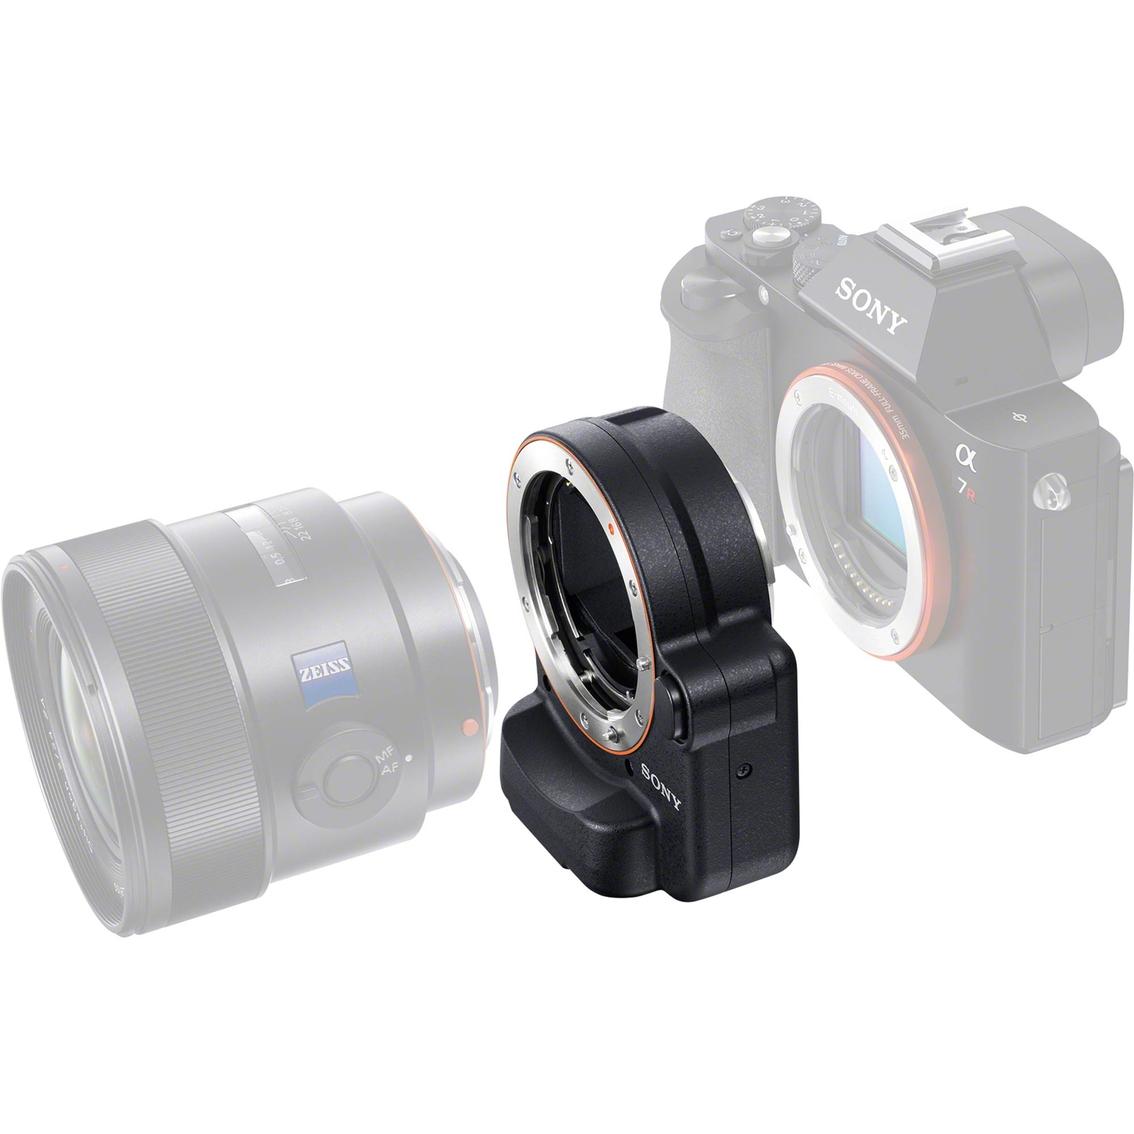 Sony La-ea4 A-mount To E-mount Full Frame Lens Adapter | Tripods ...